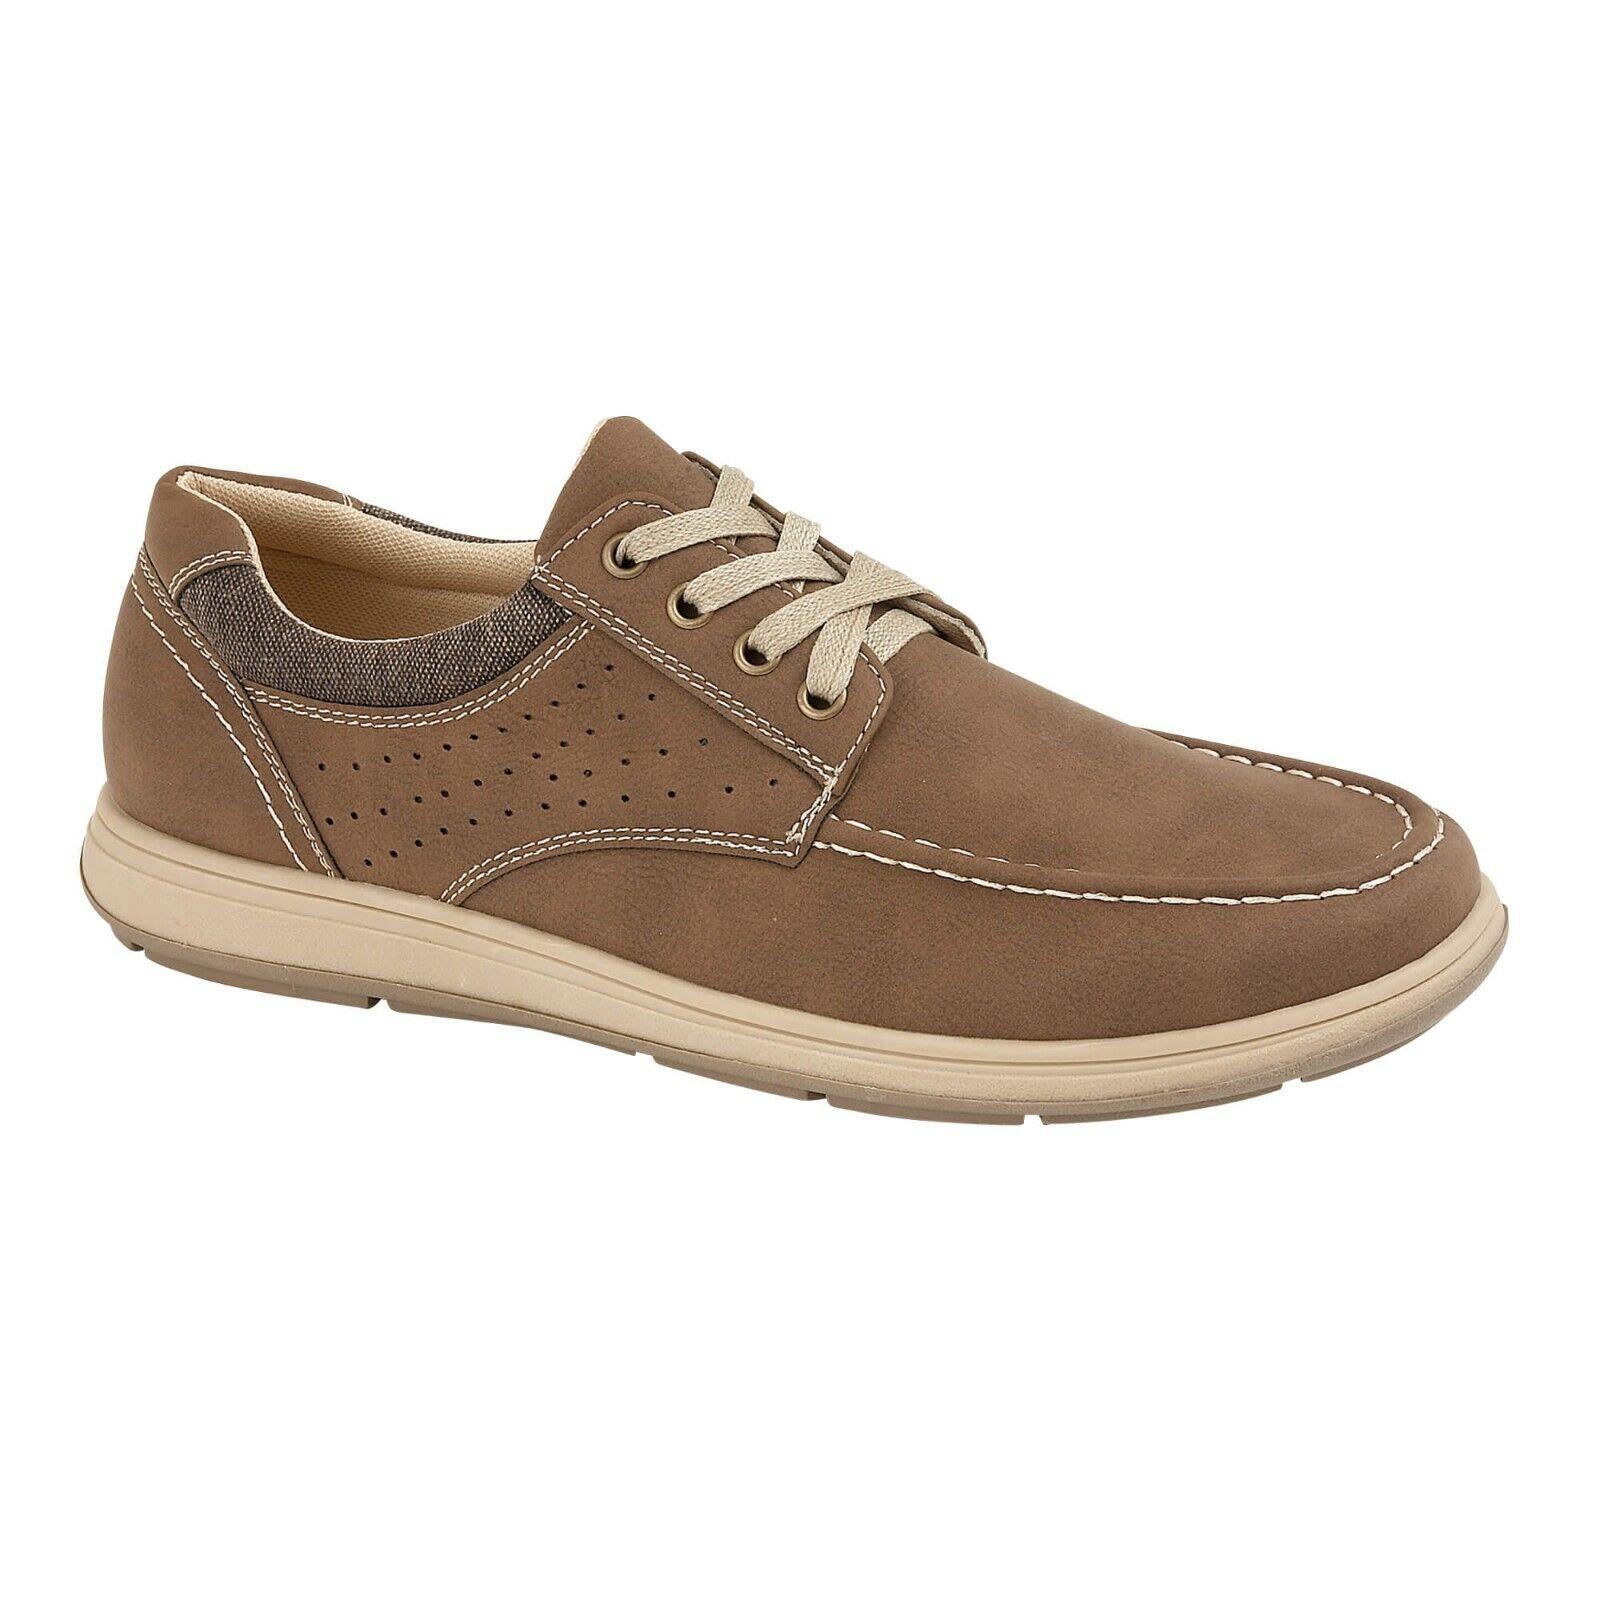 Hommes Casual Charles Southwell confort de marche à lacets Chaussures UK 7 8 9 10 11 12